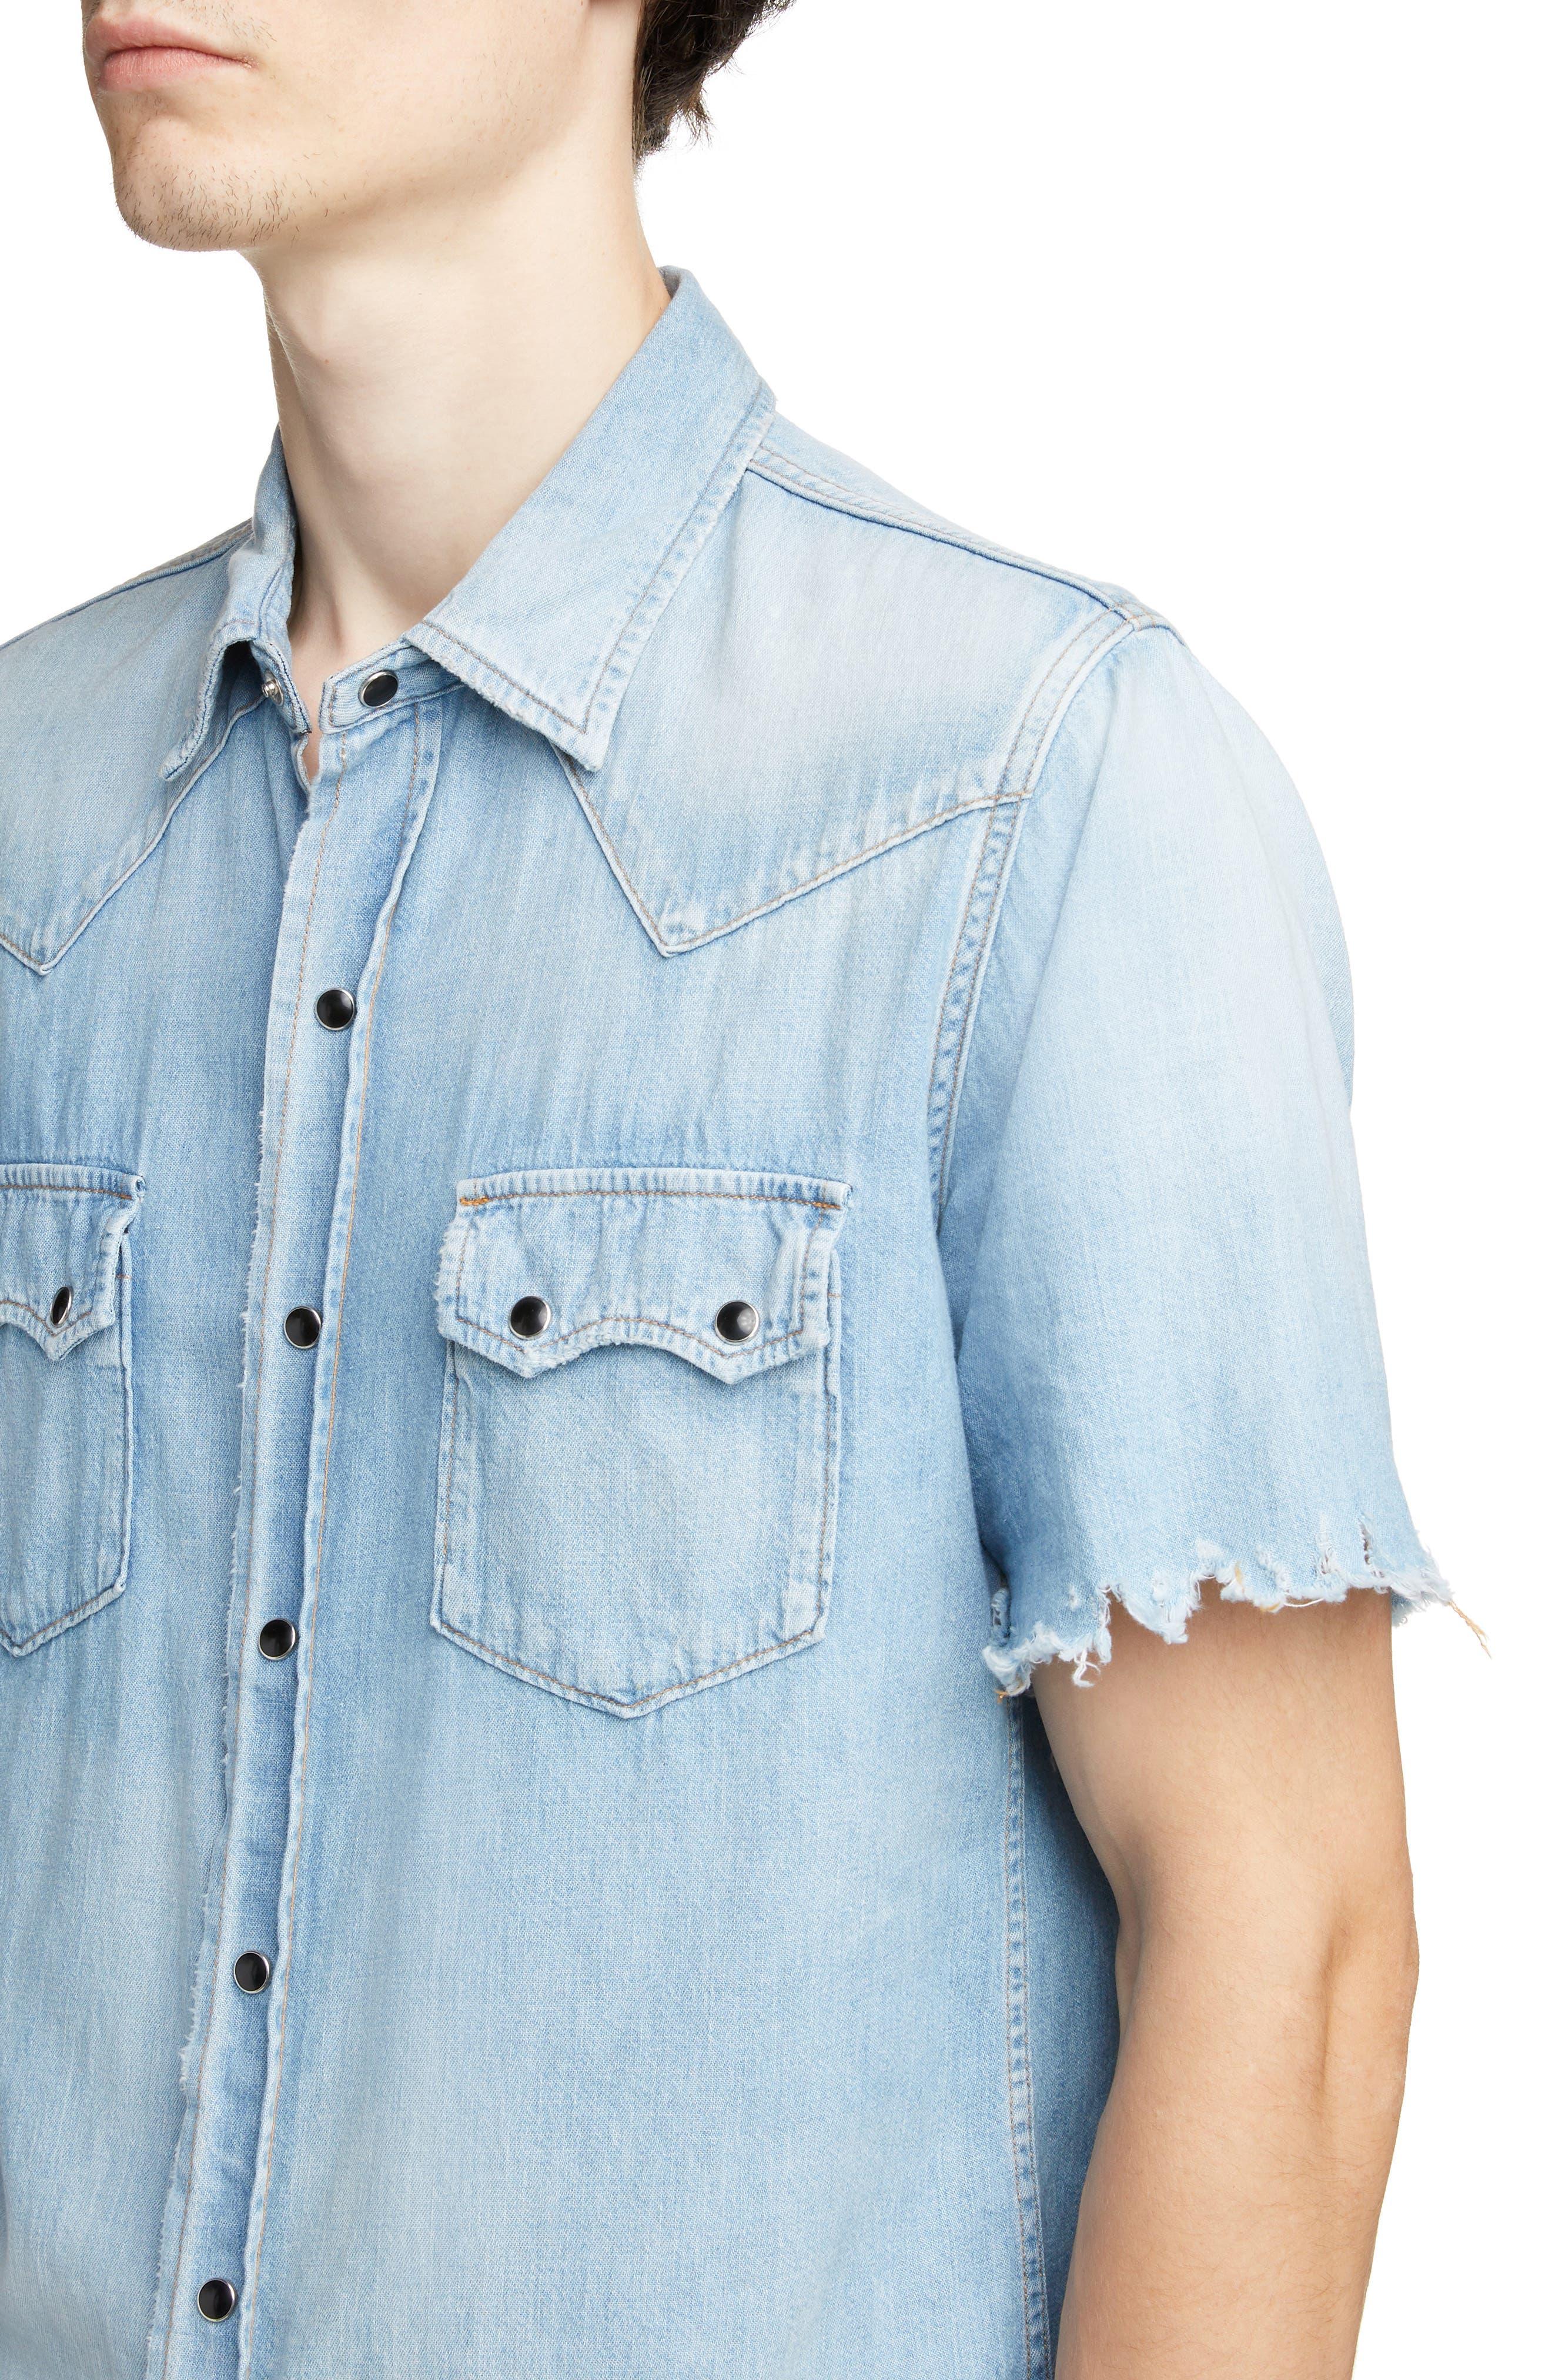 54269d5e756 Men's Denim Shirts | Nordstrom